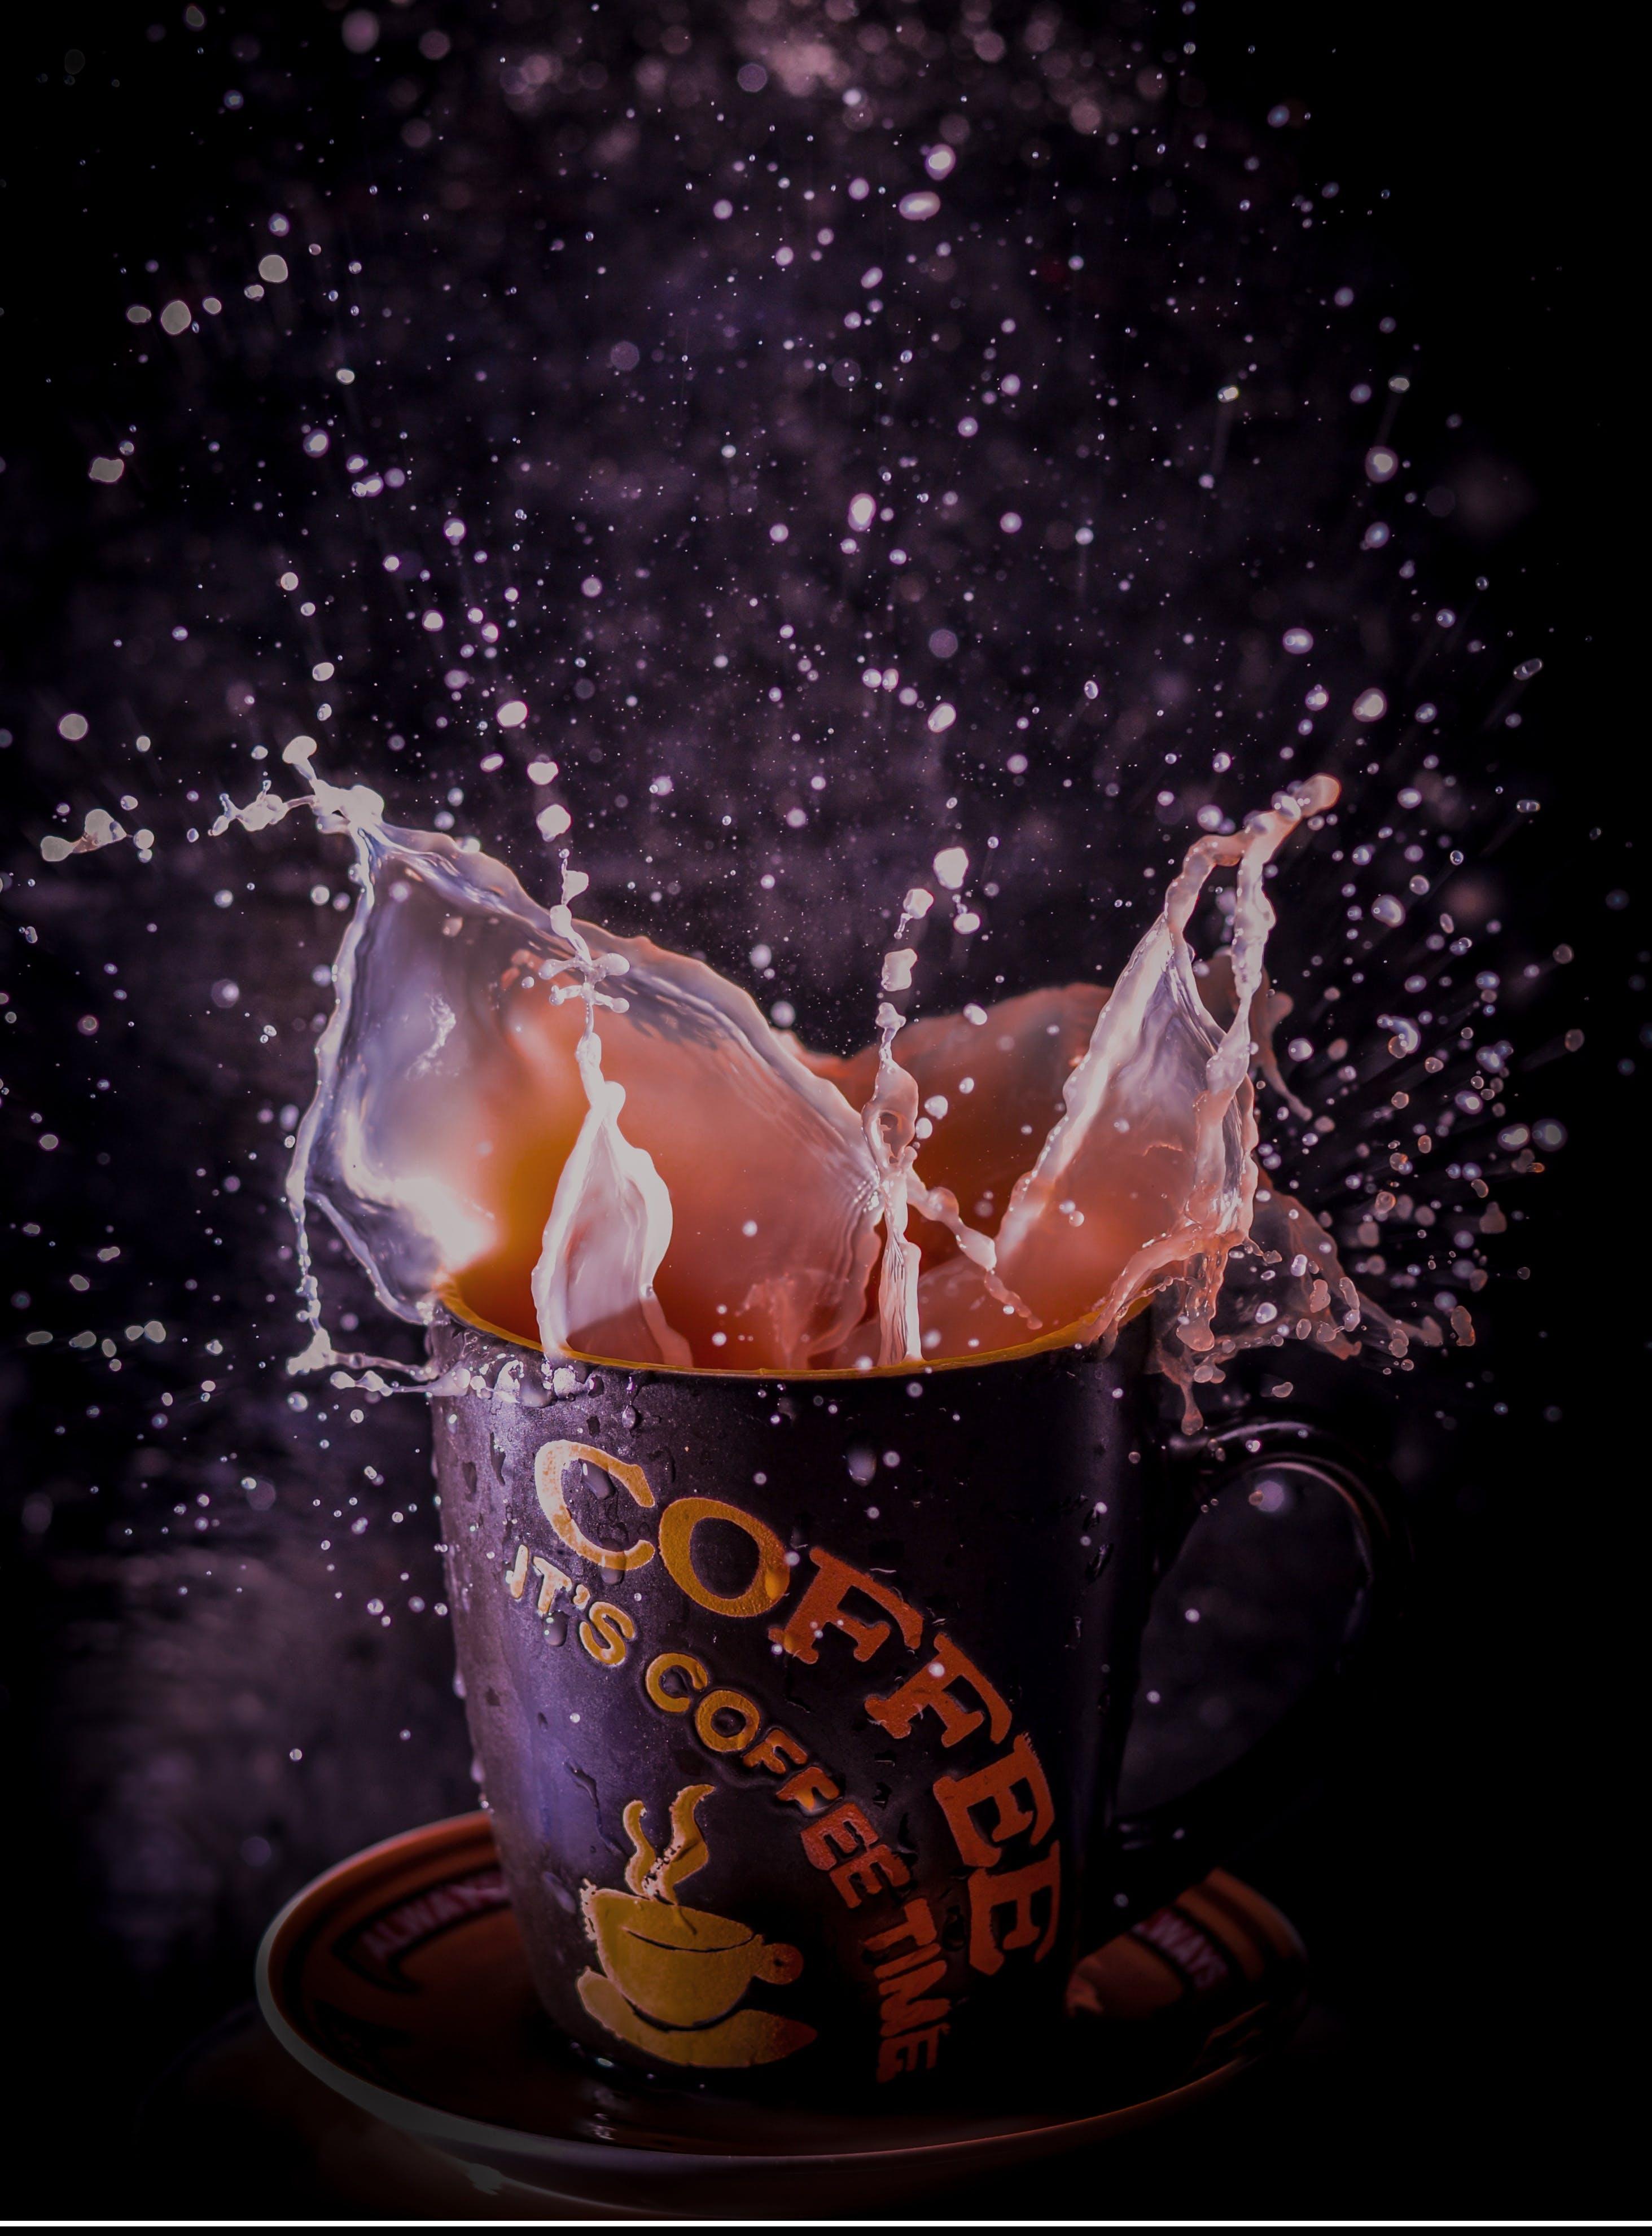 Free stock photo of Coffee, splash